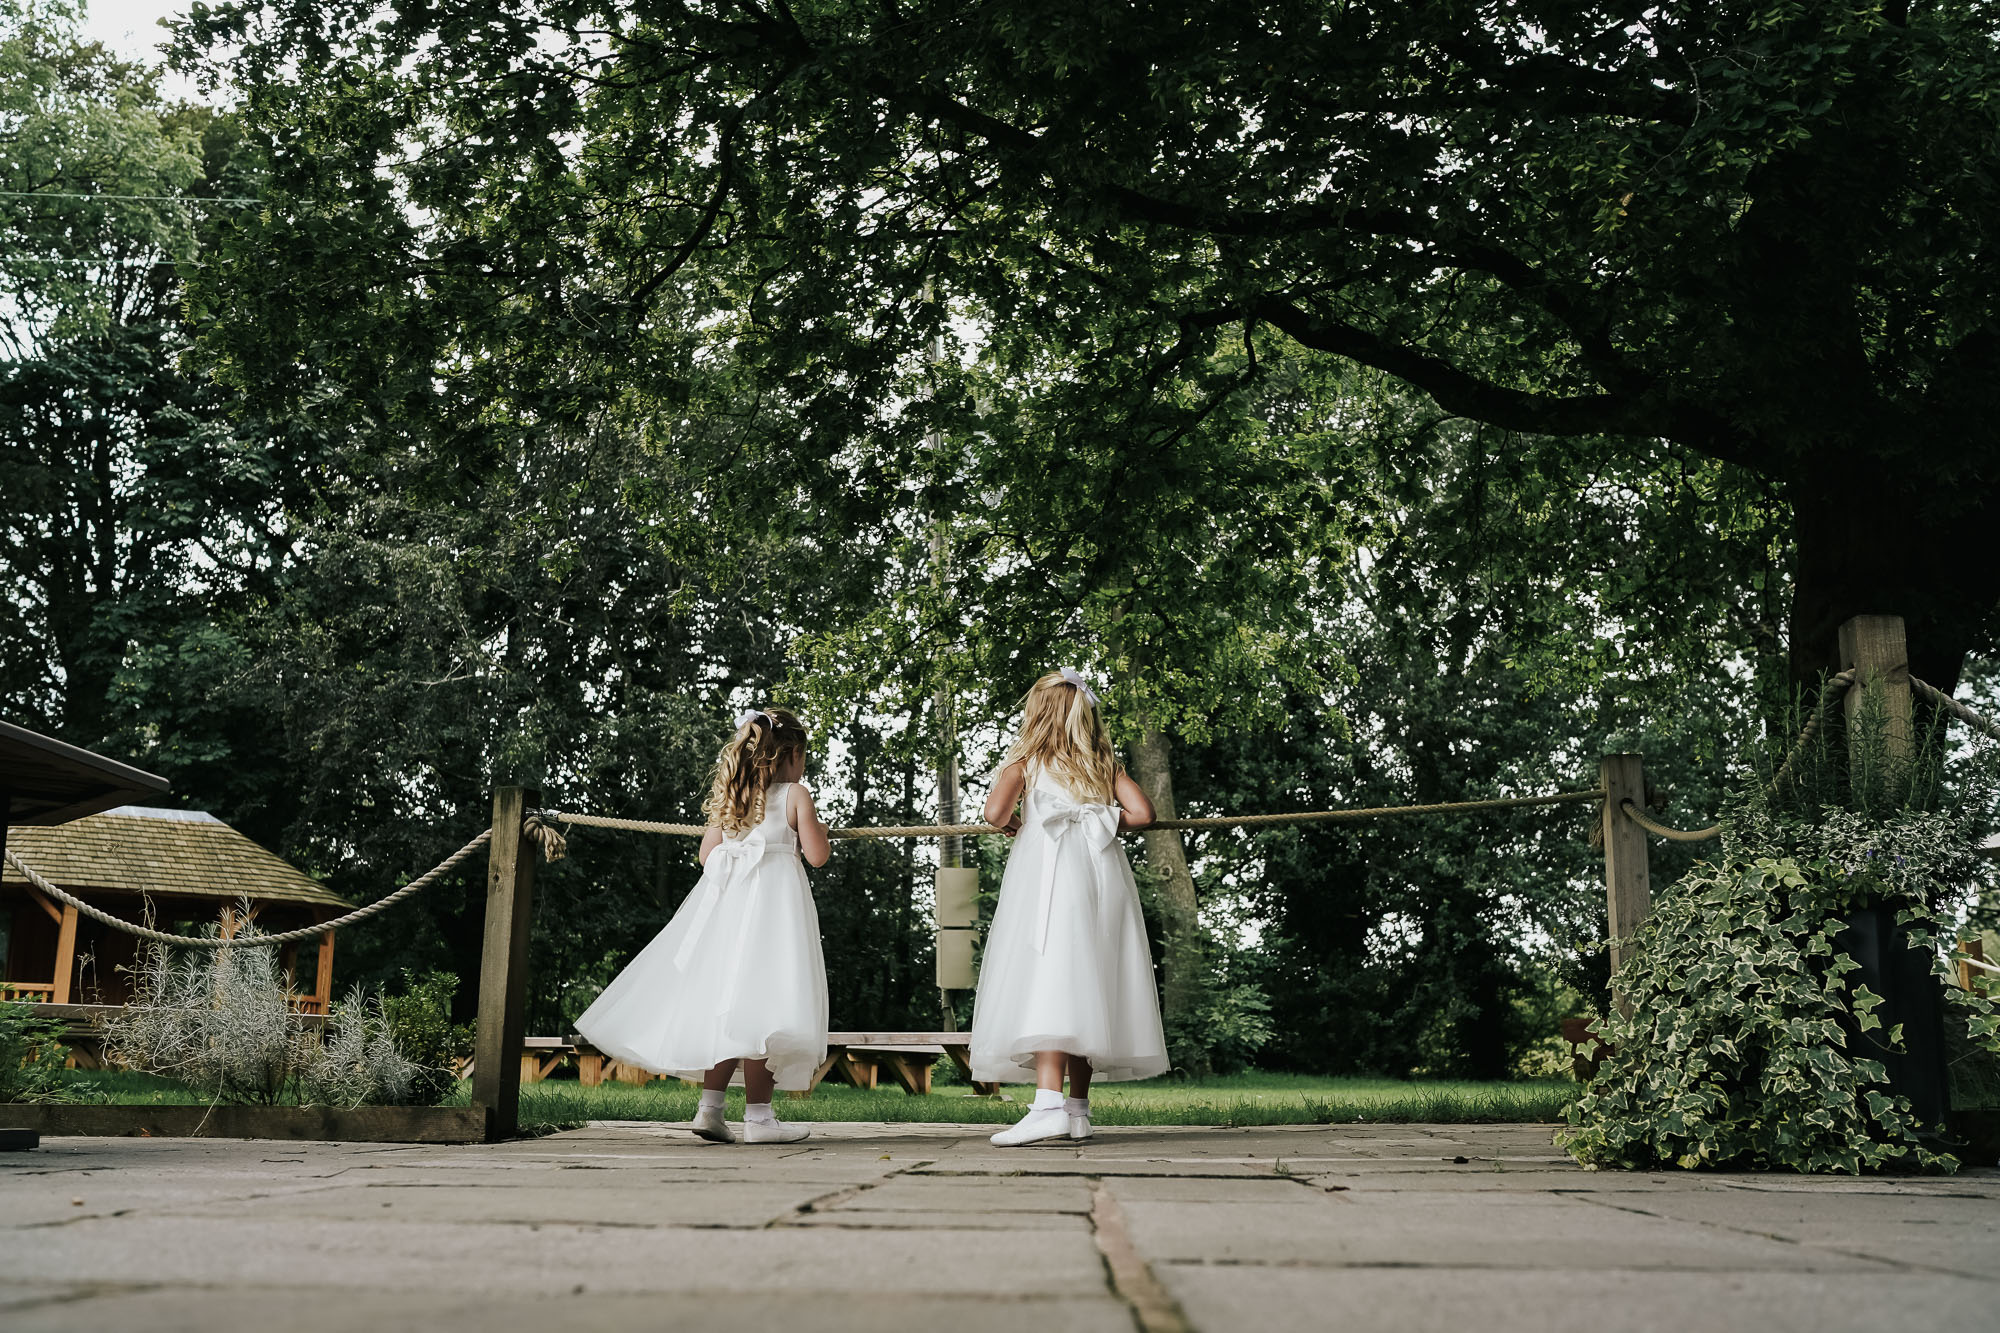 Oak tree of peover wedding photography cheshire wedding photographer (31 of 56).jpg